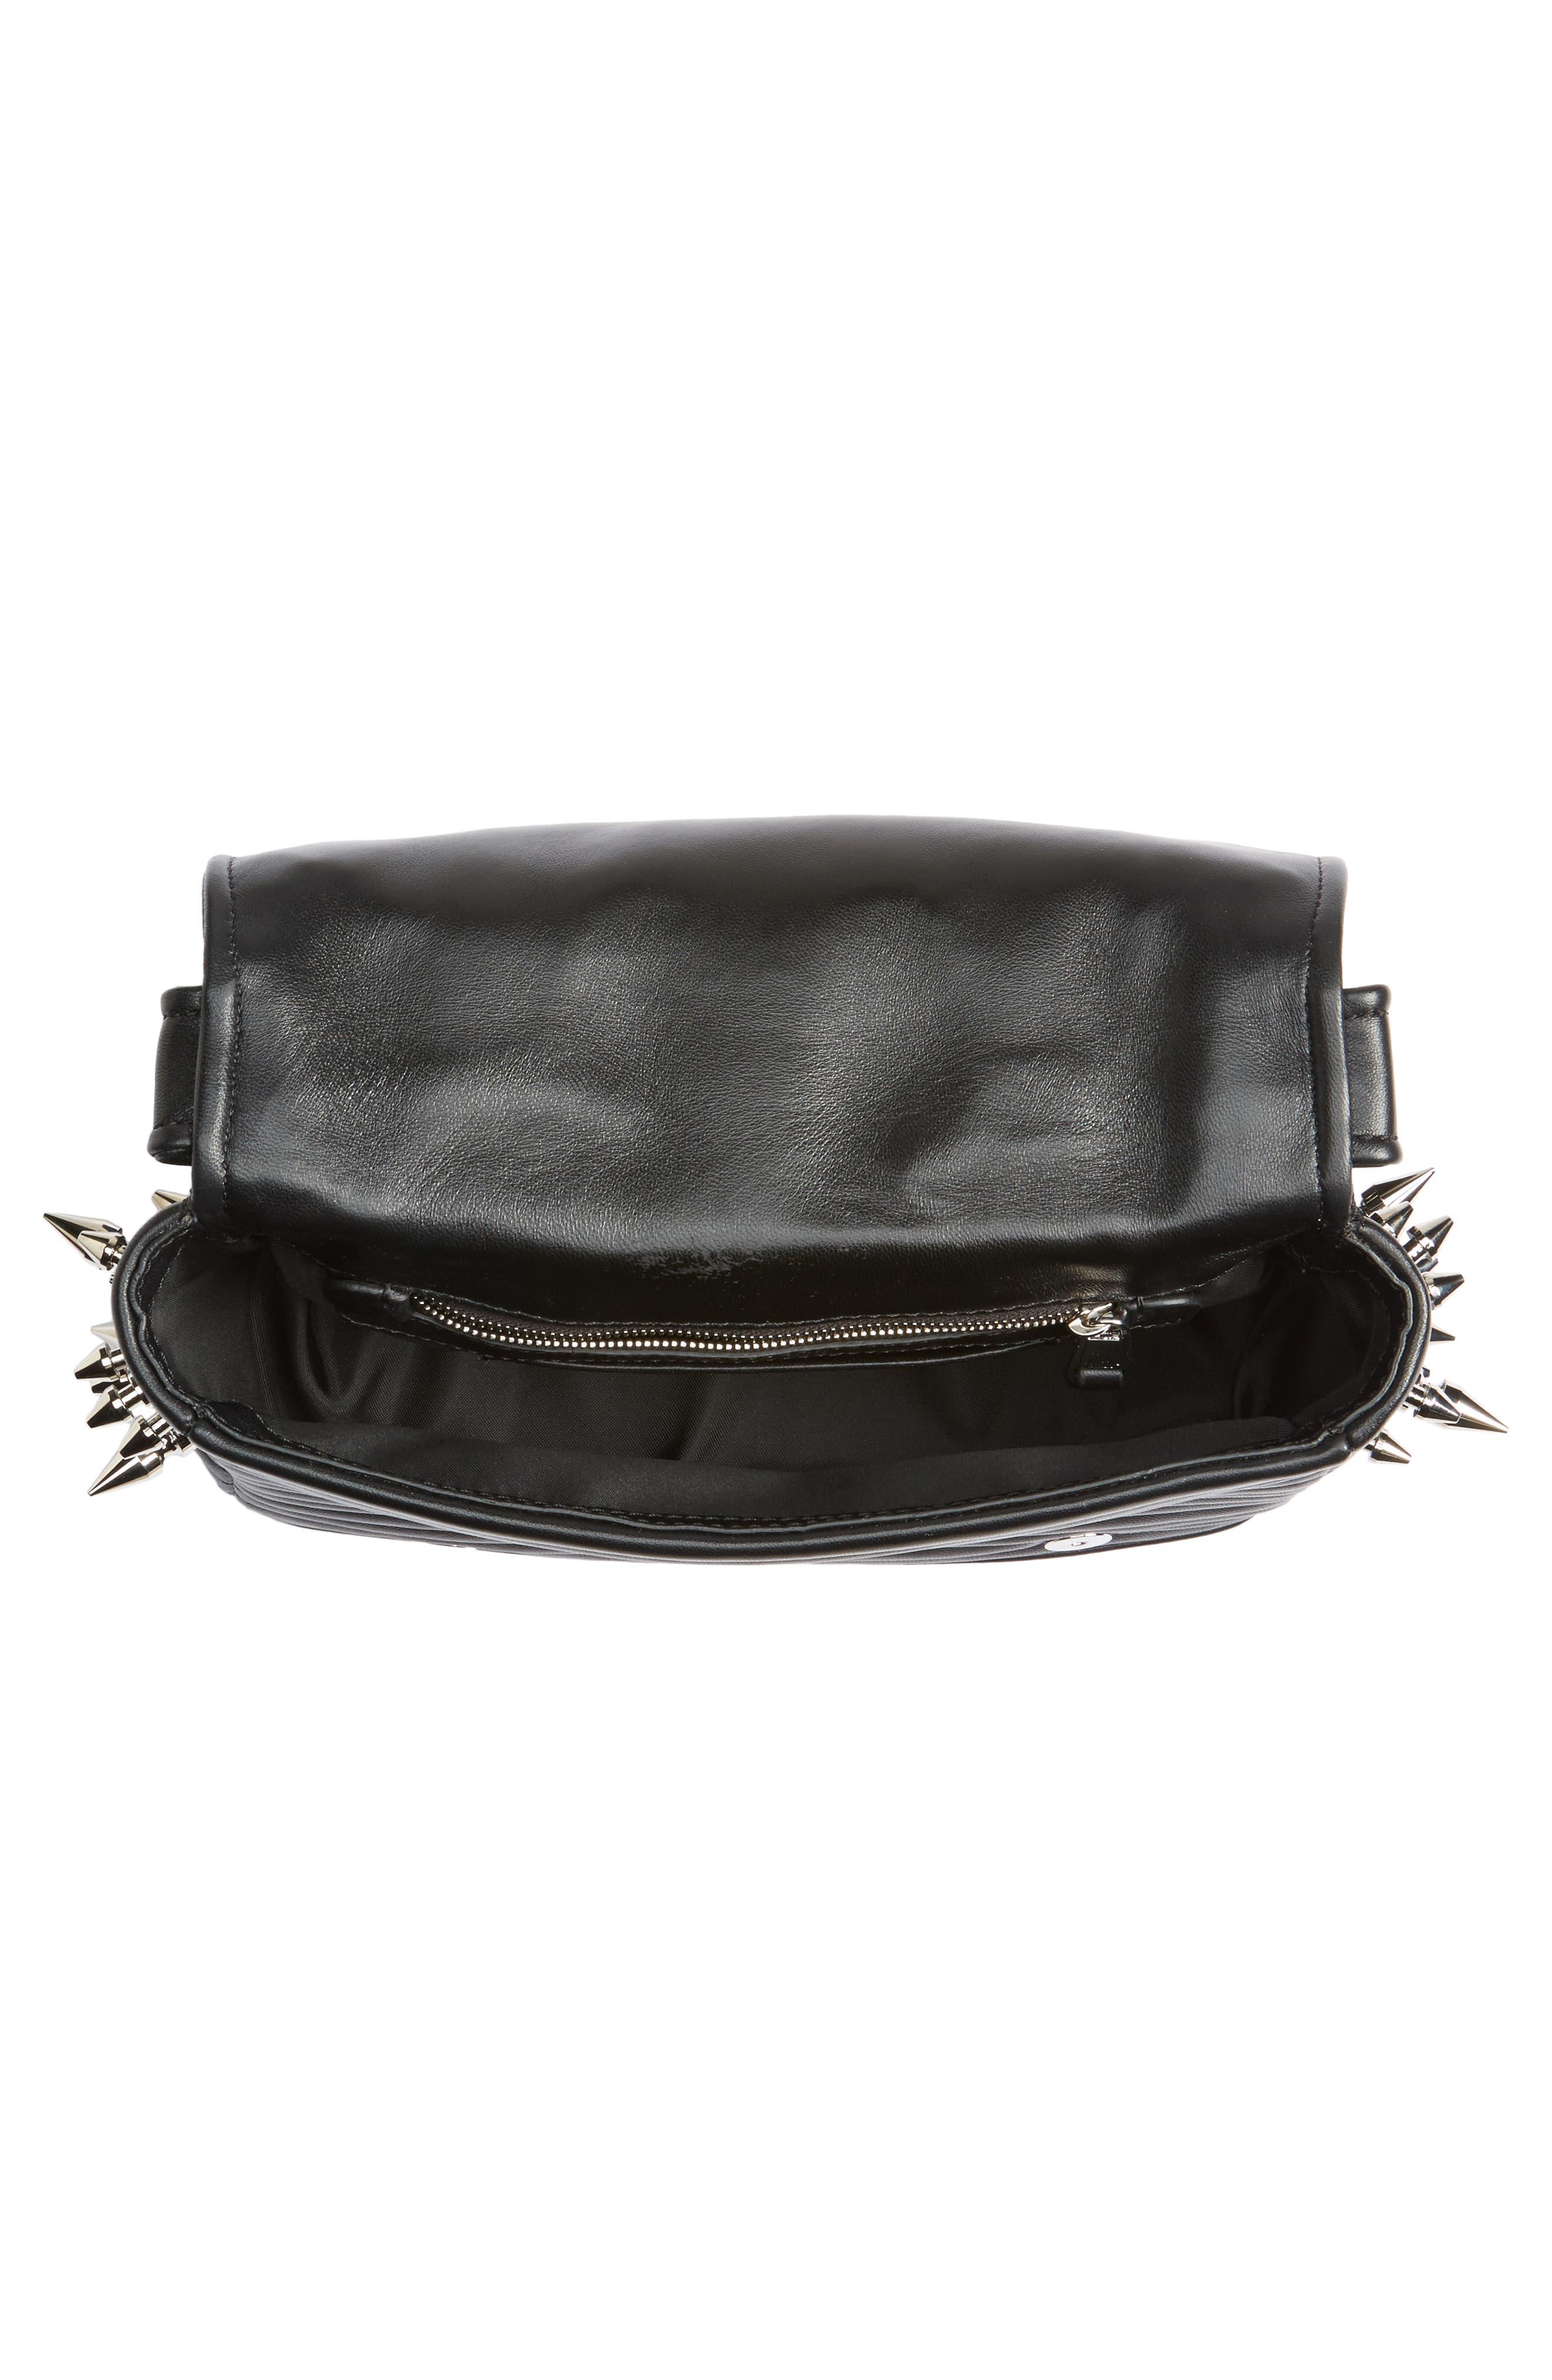 Spiked Biker Jacket Crossbody Bag,                             Alternate thumbnail 4, color,                             Black/ Nickel